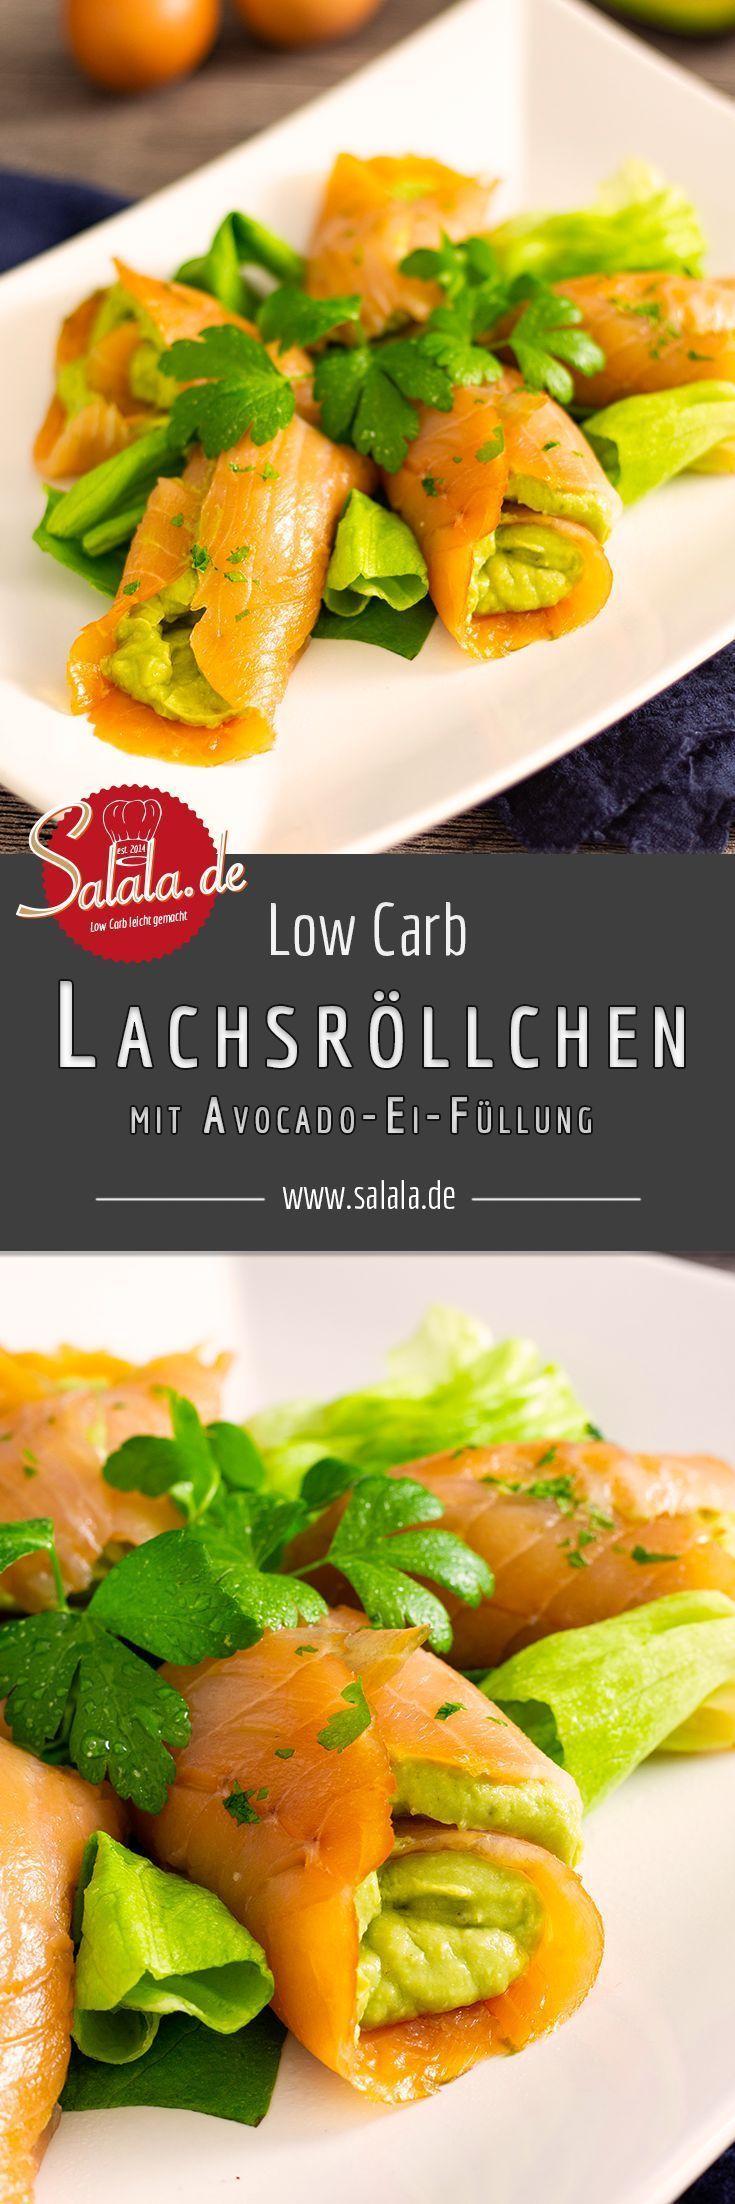 Salmon rolls with avocado and egg cream  -  Hautpflege-Rezepte